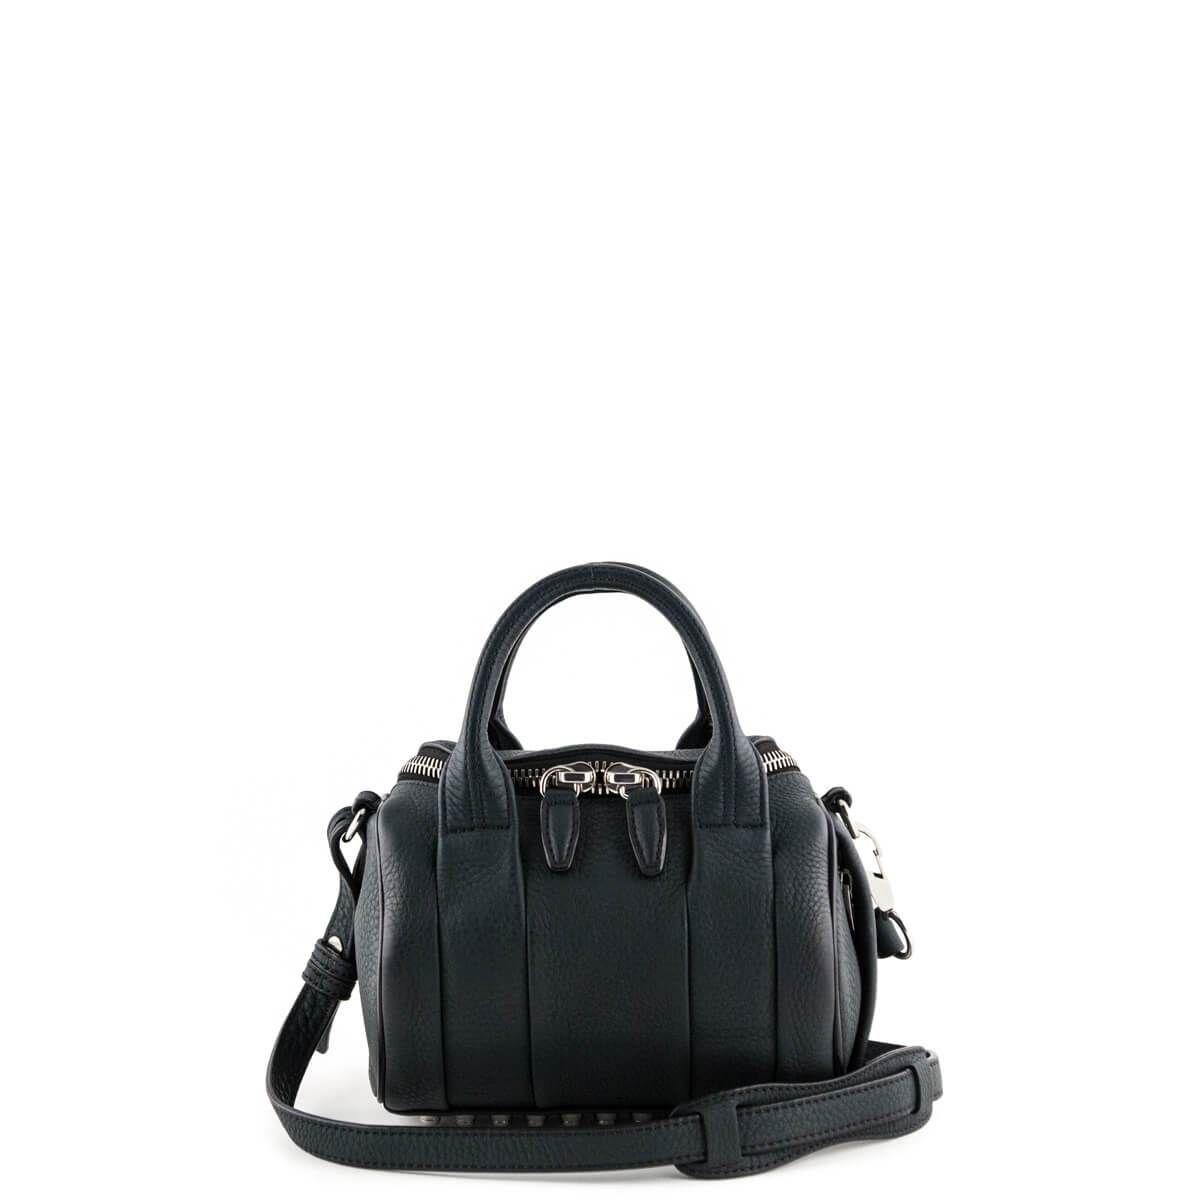 Alexander Forest Calfskin Mini Rockie Bag Designer Pursesdesigner Handbagsluxury